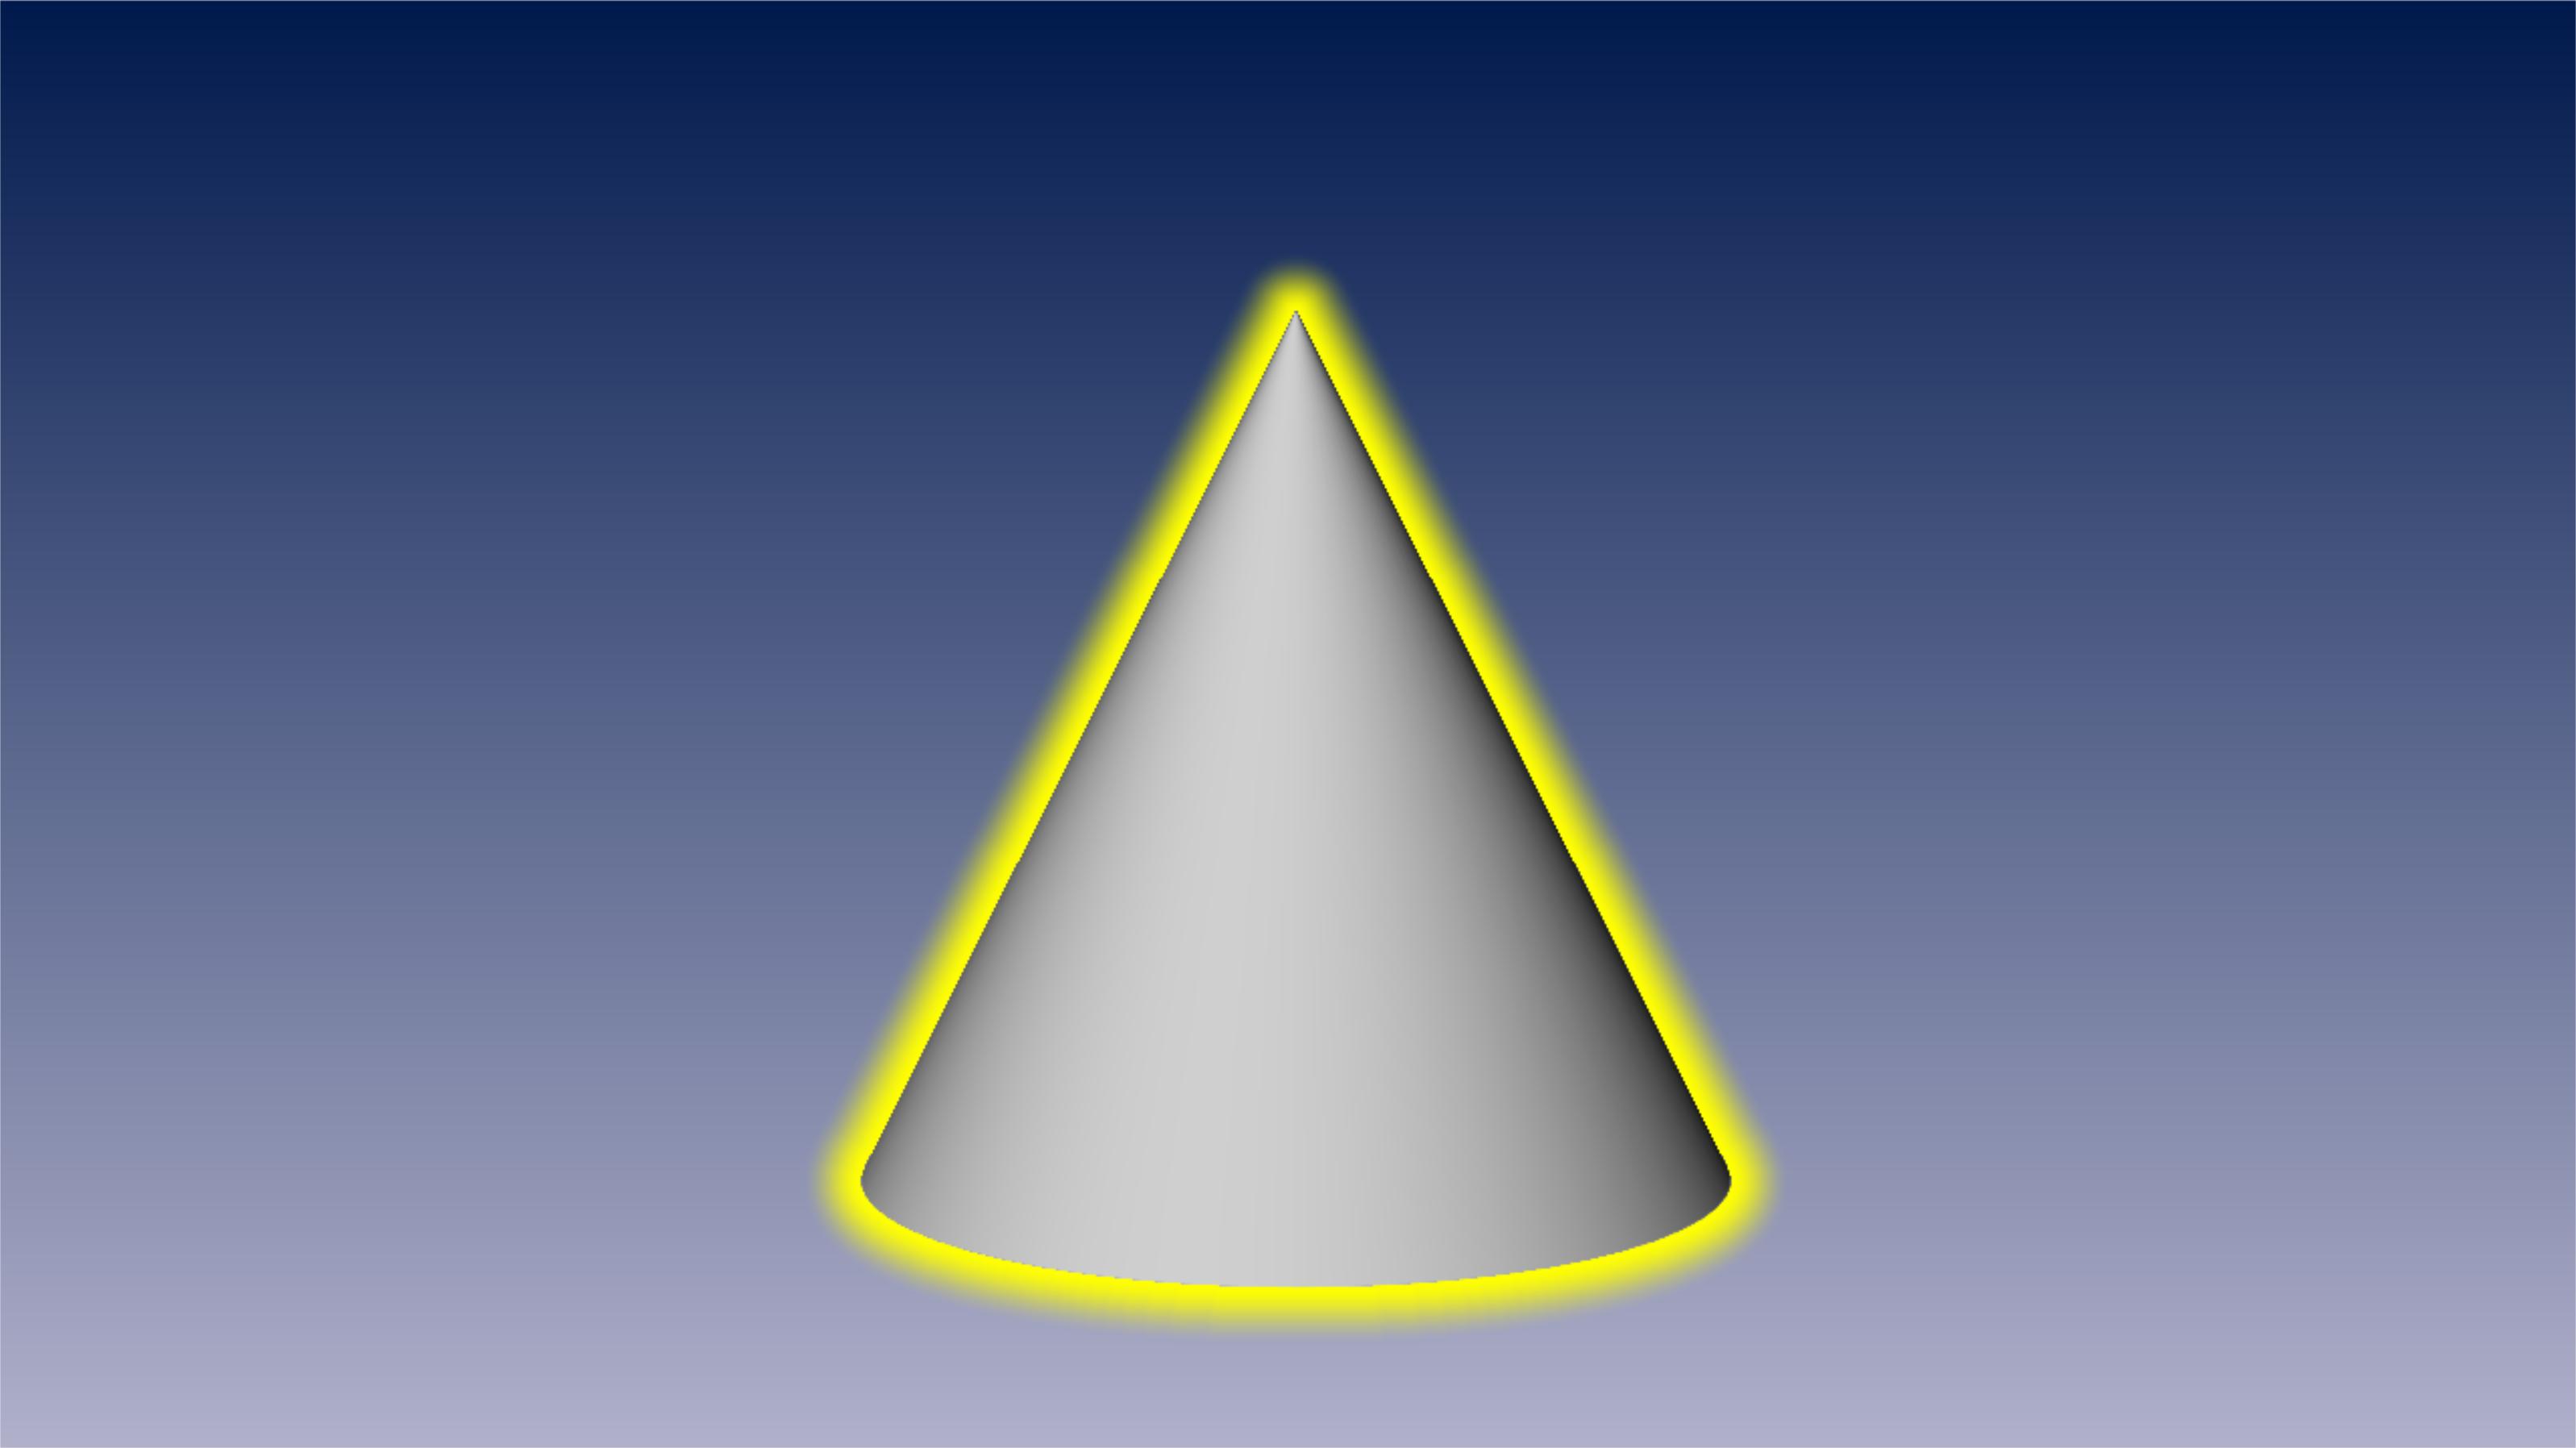 Halo Highlighting